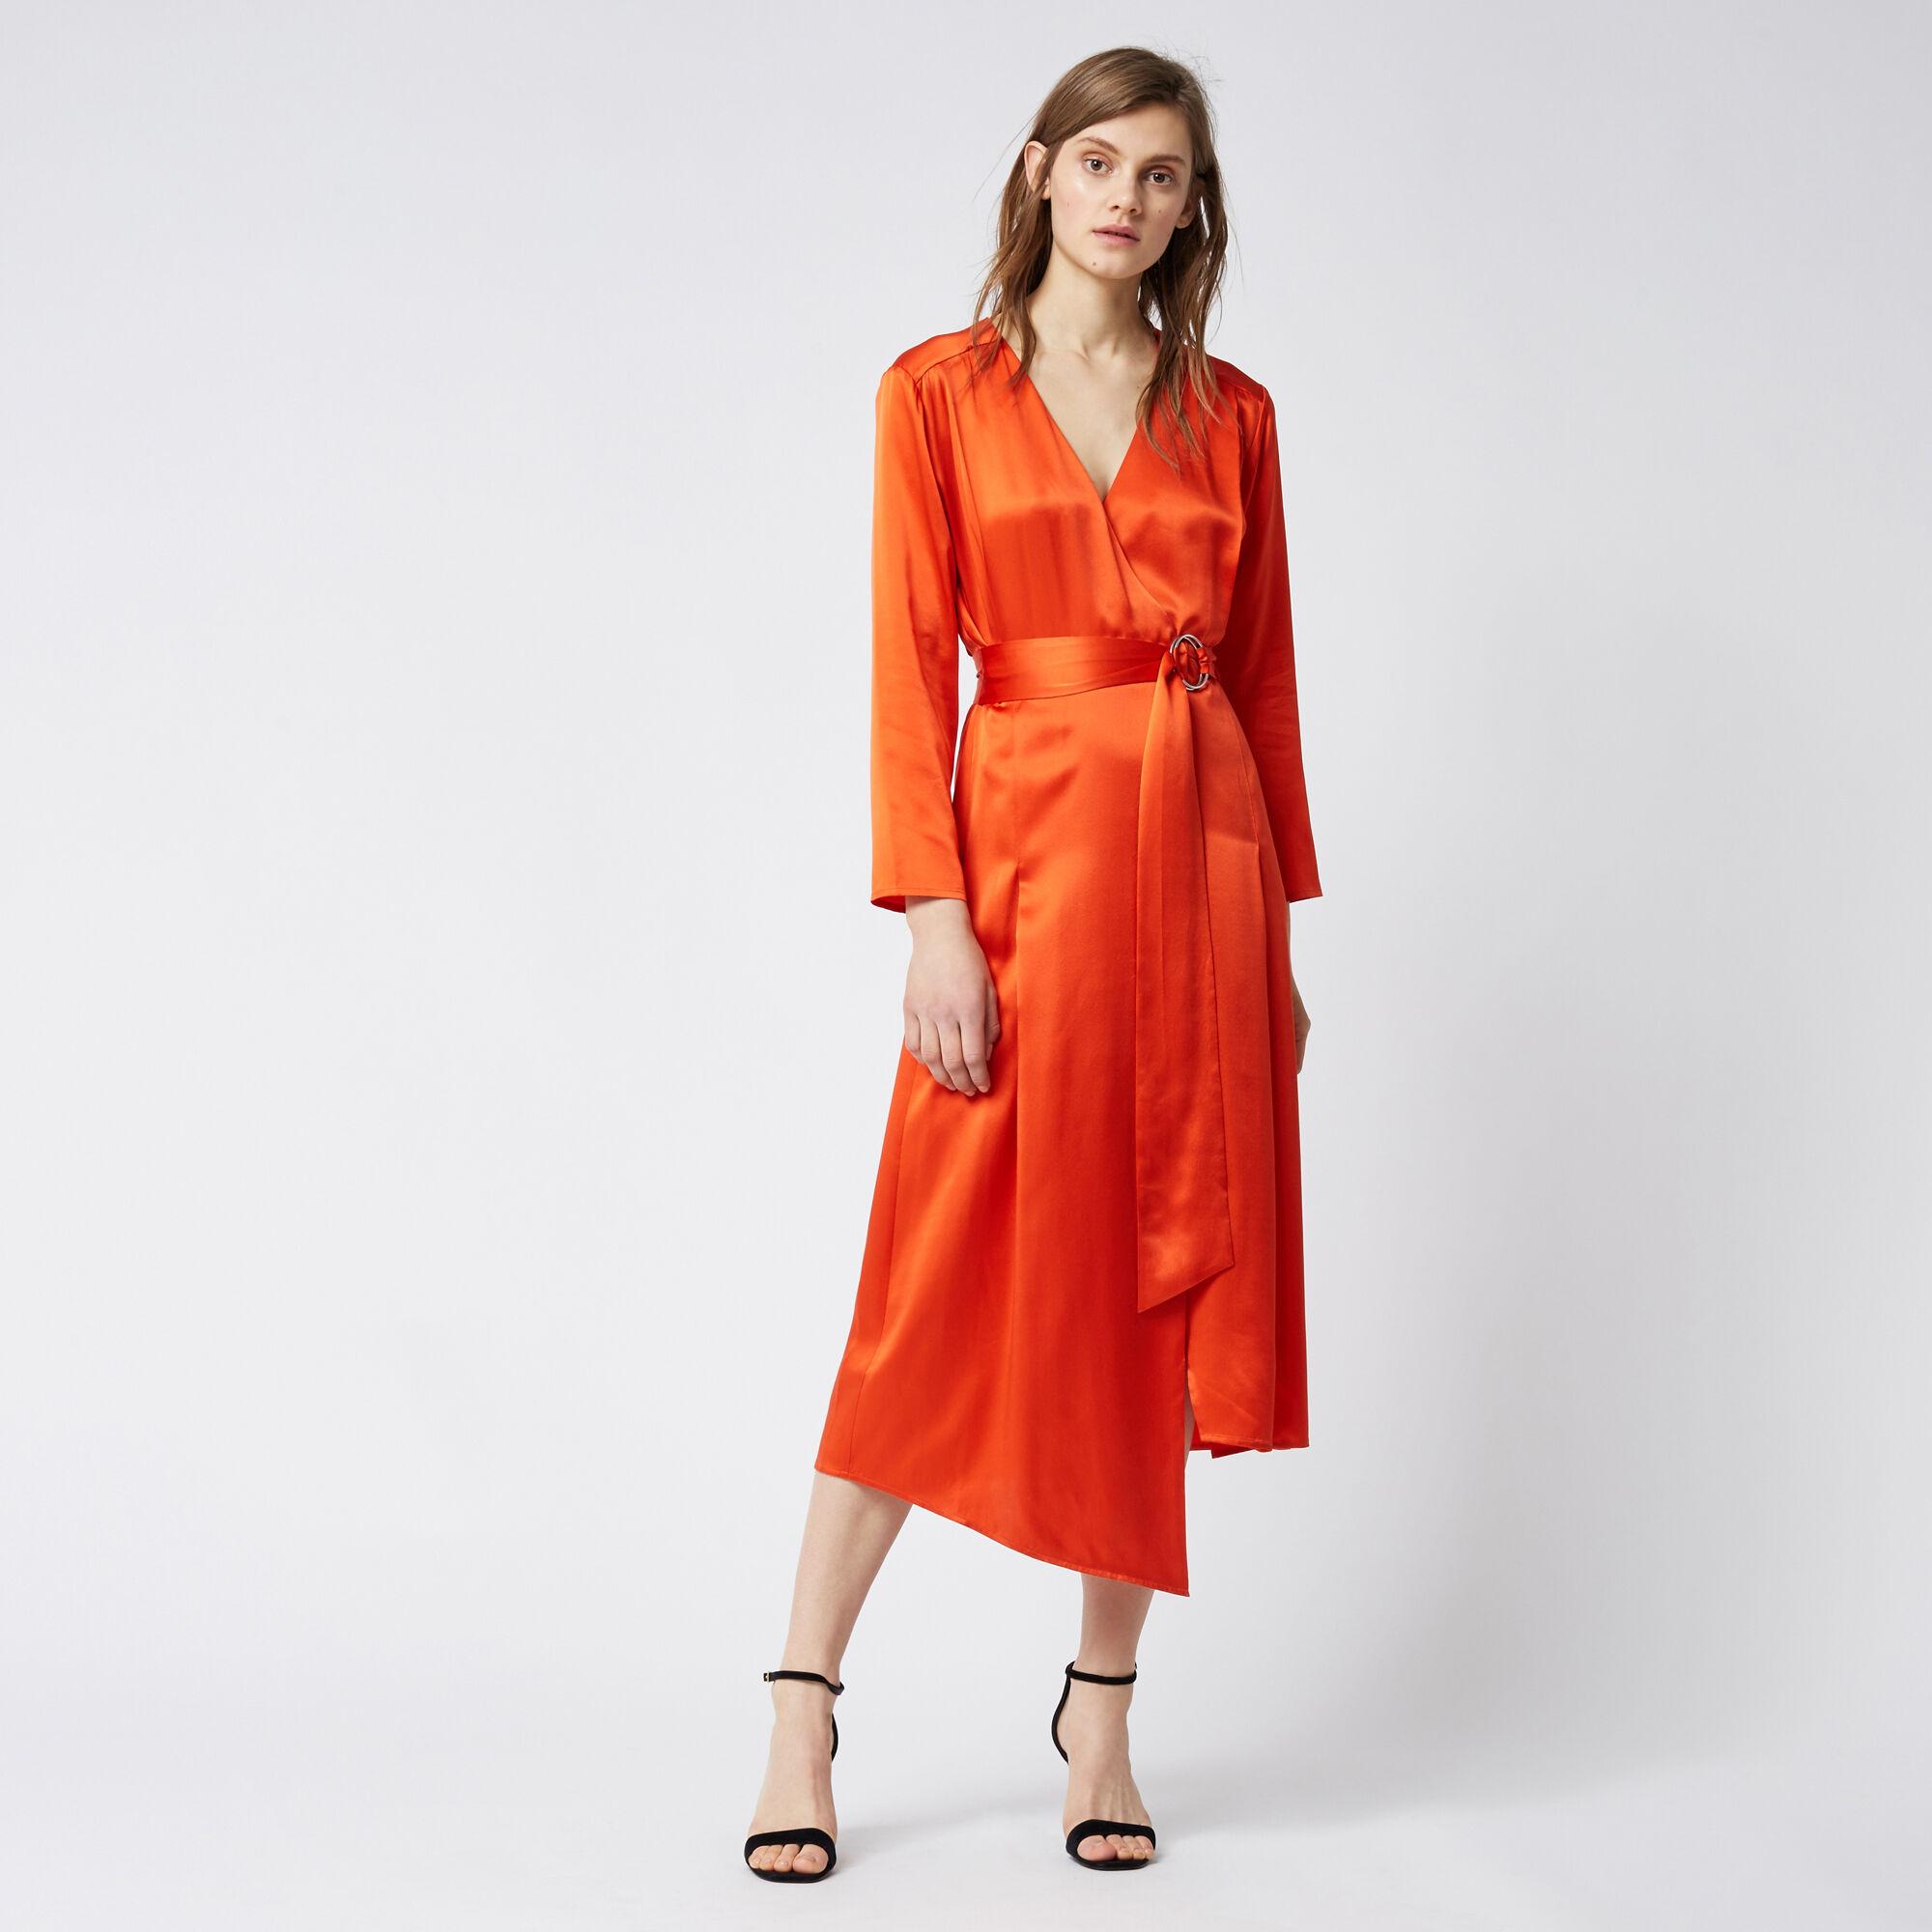 Silk Satin Long Sleeve Wrap Dress